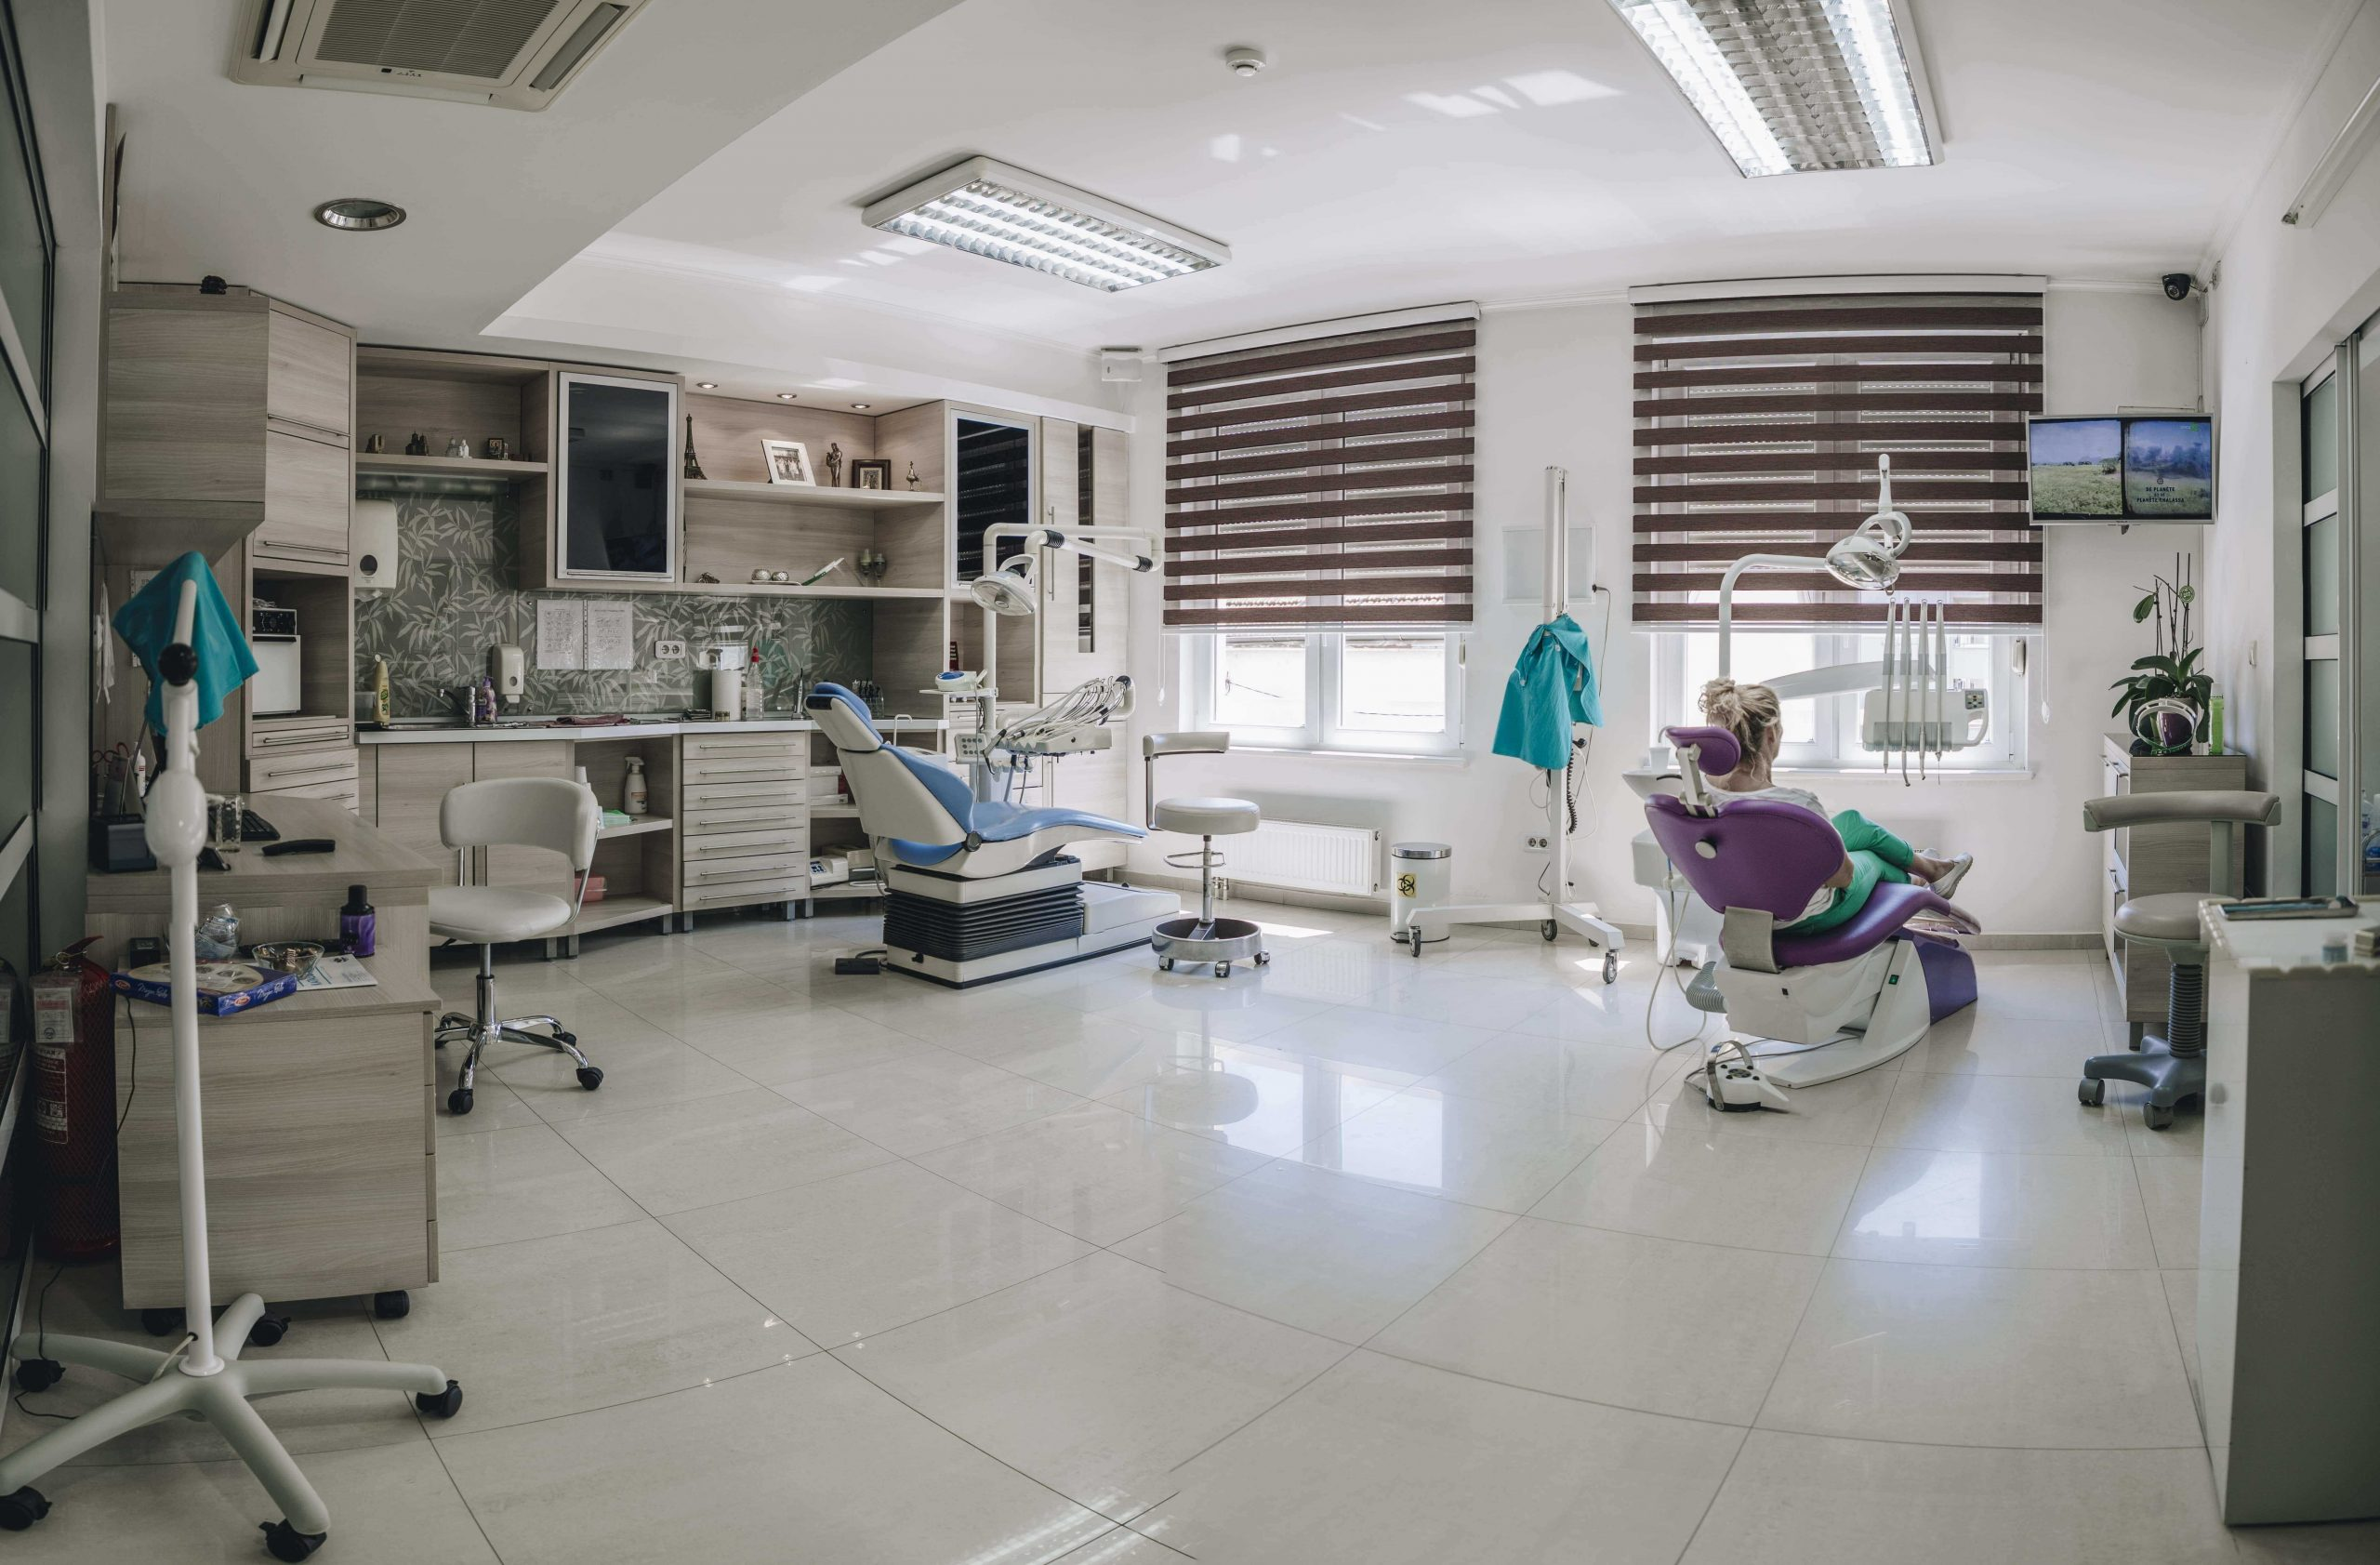 Stomatologija dr mecava banja luka zubar klinika zubari